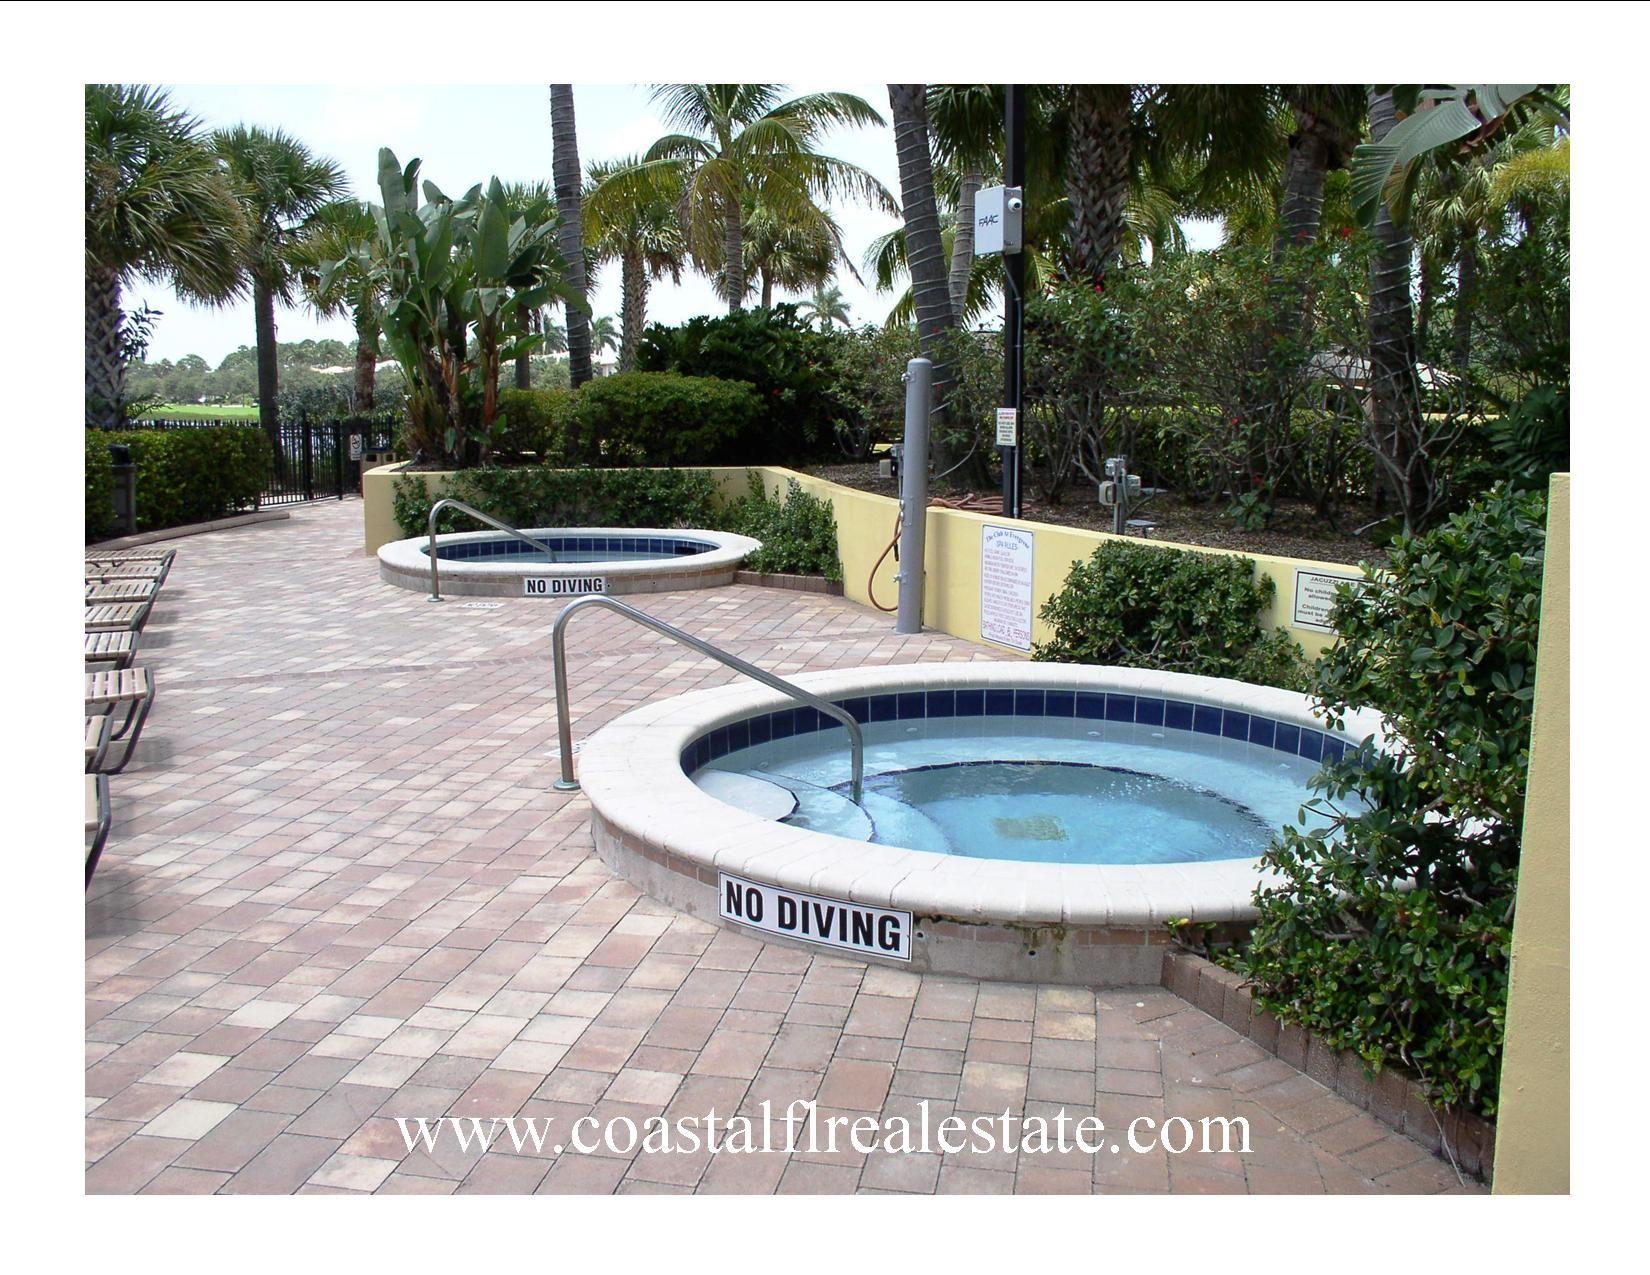 63536a1ddf3a06eeb05889bb3b65651b - Homes For Rent Evergrene Palm Beach Gardens